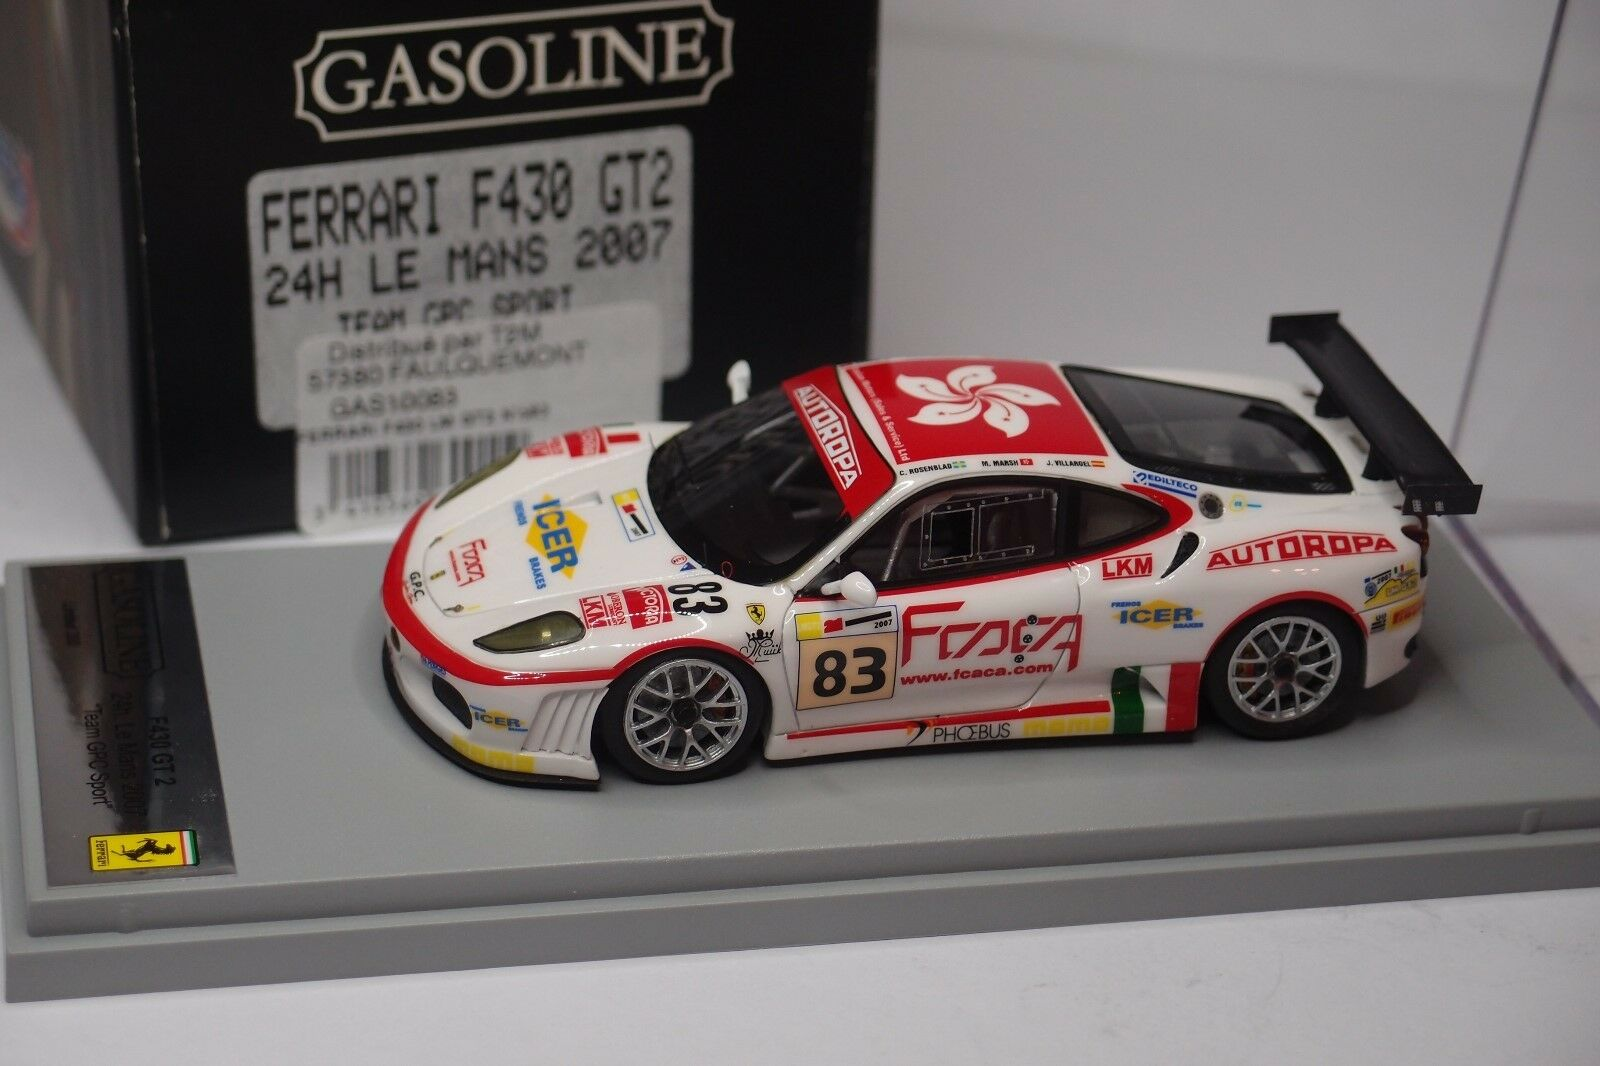 BBR FERRARI F430 GT2  83 TEAM GPC SPORT LE MANS 2007 1 43